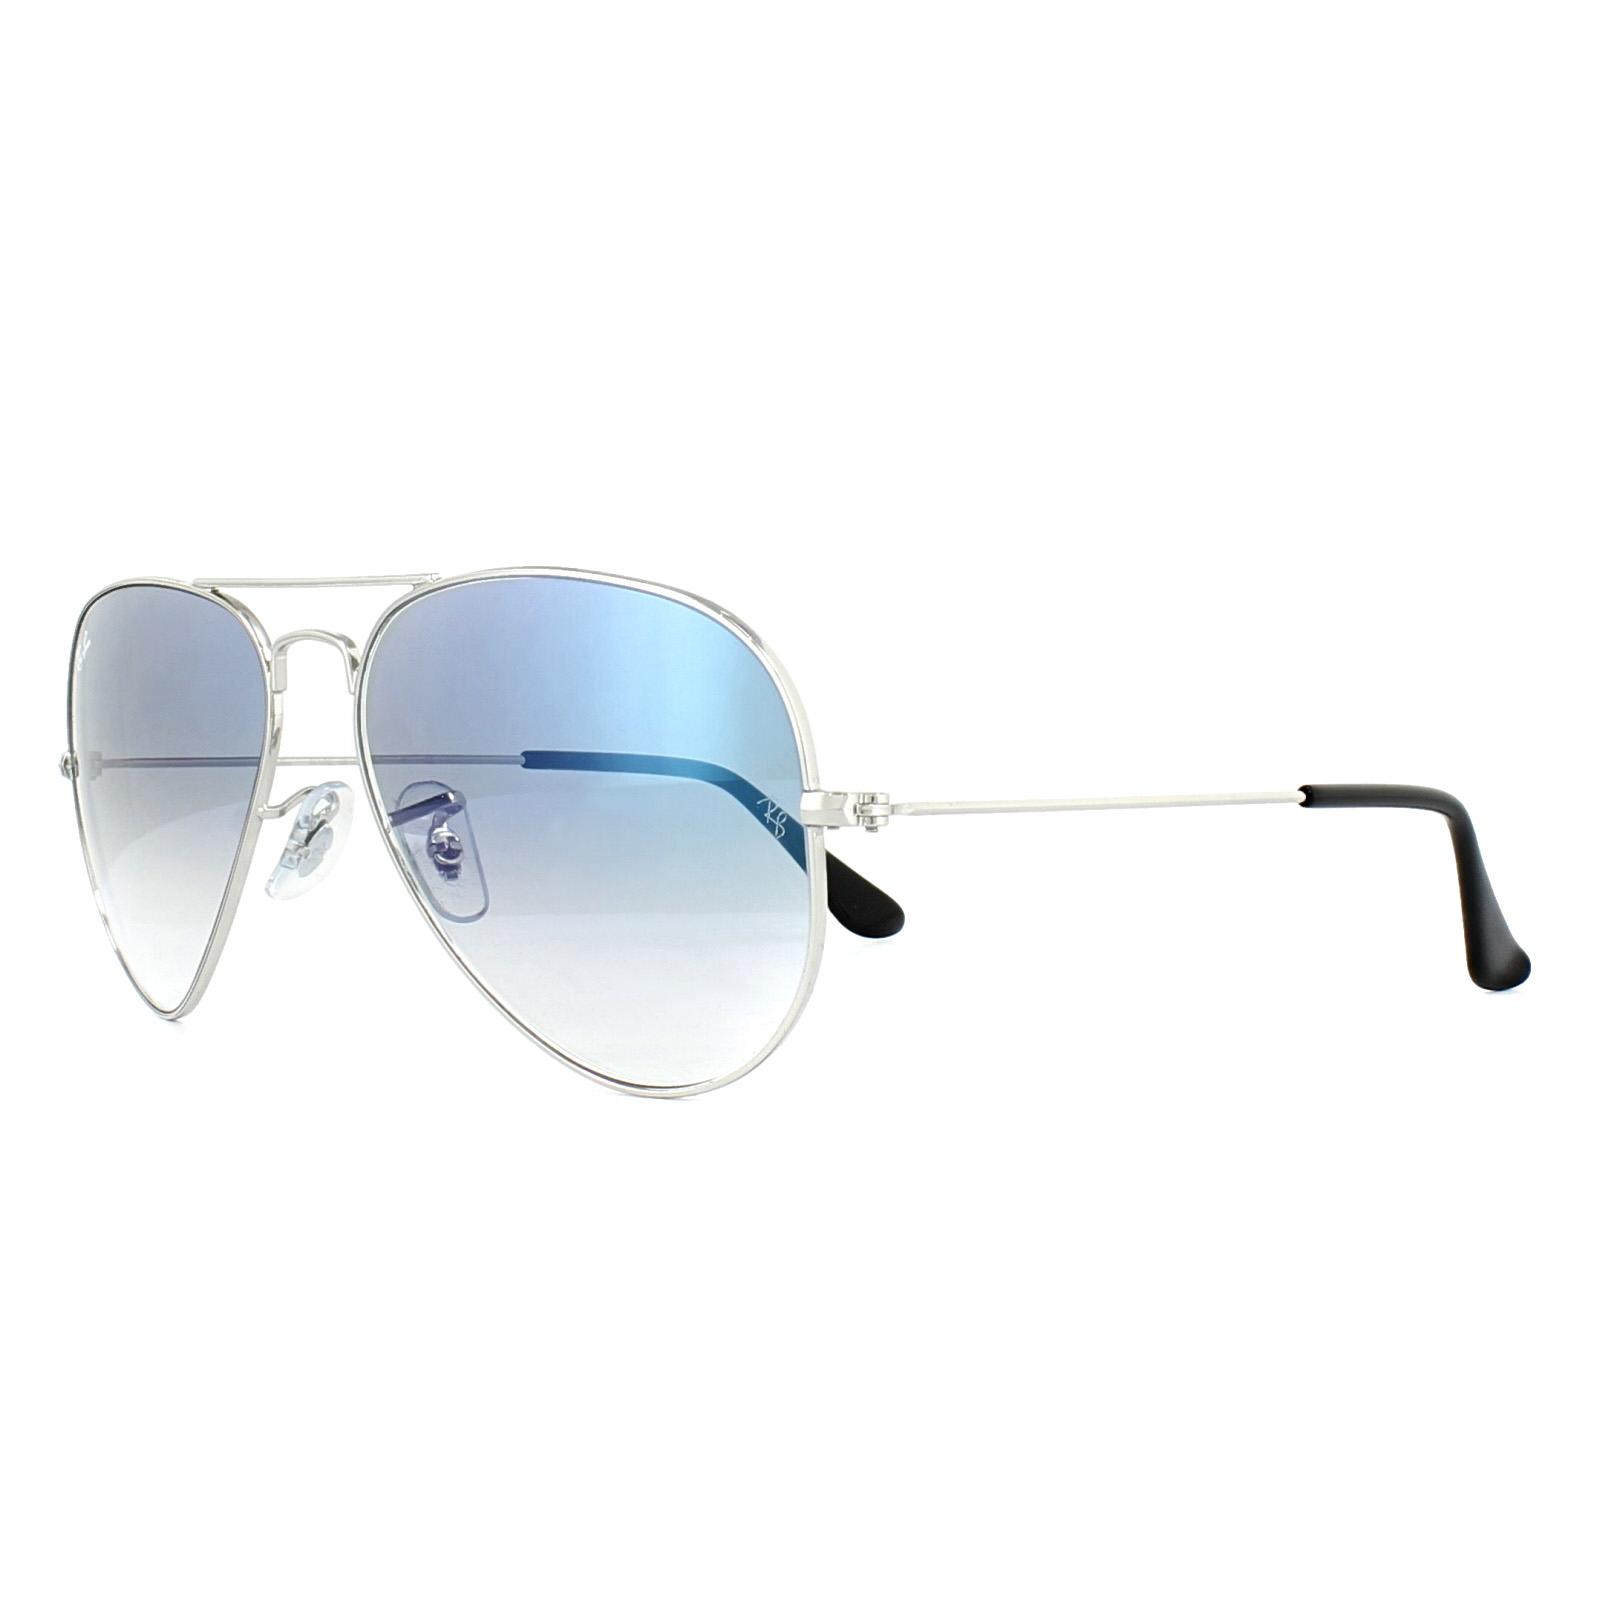 d4cb1b2cd336b Sentinel Ray-Ban Sunglasses Aviator 3025 003 3F Silver Light Blue Gradient